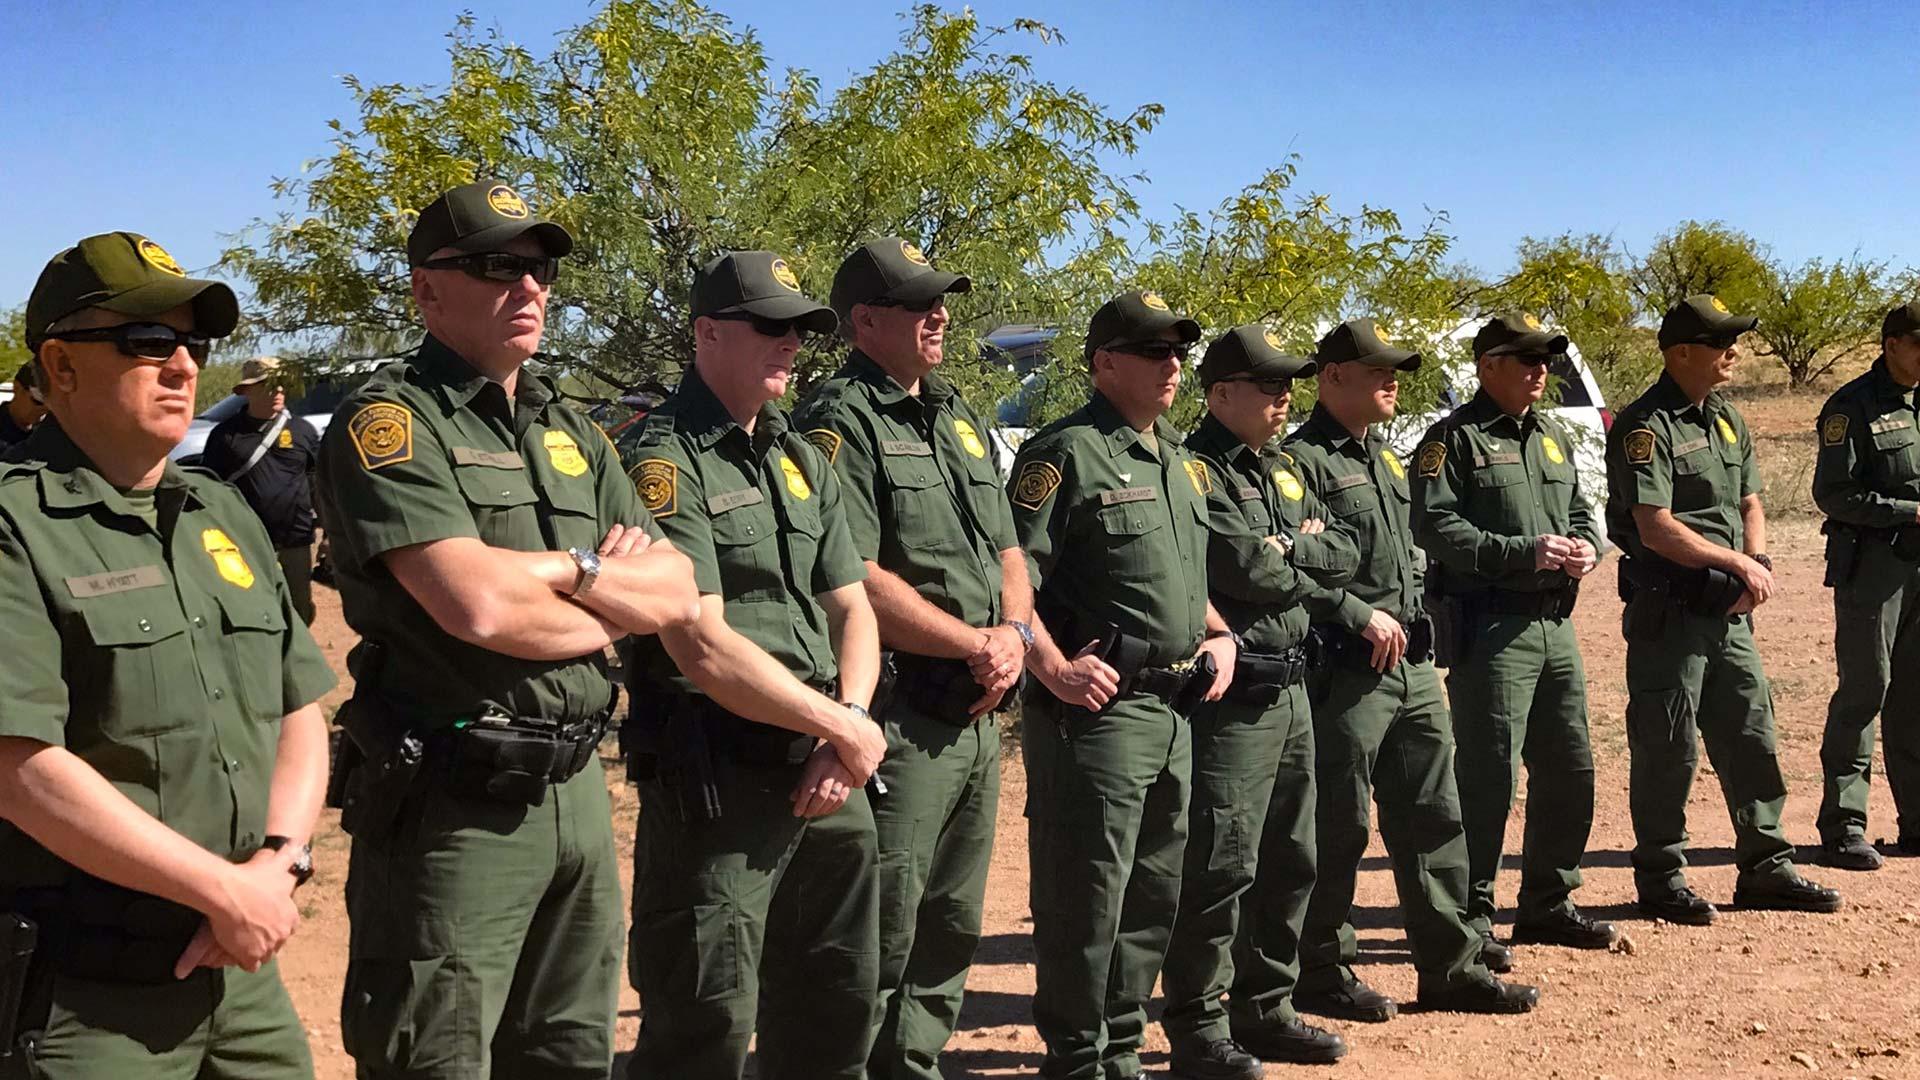 Border patrol line up